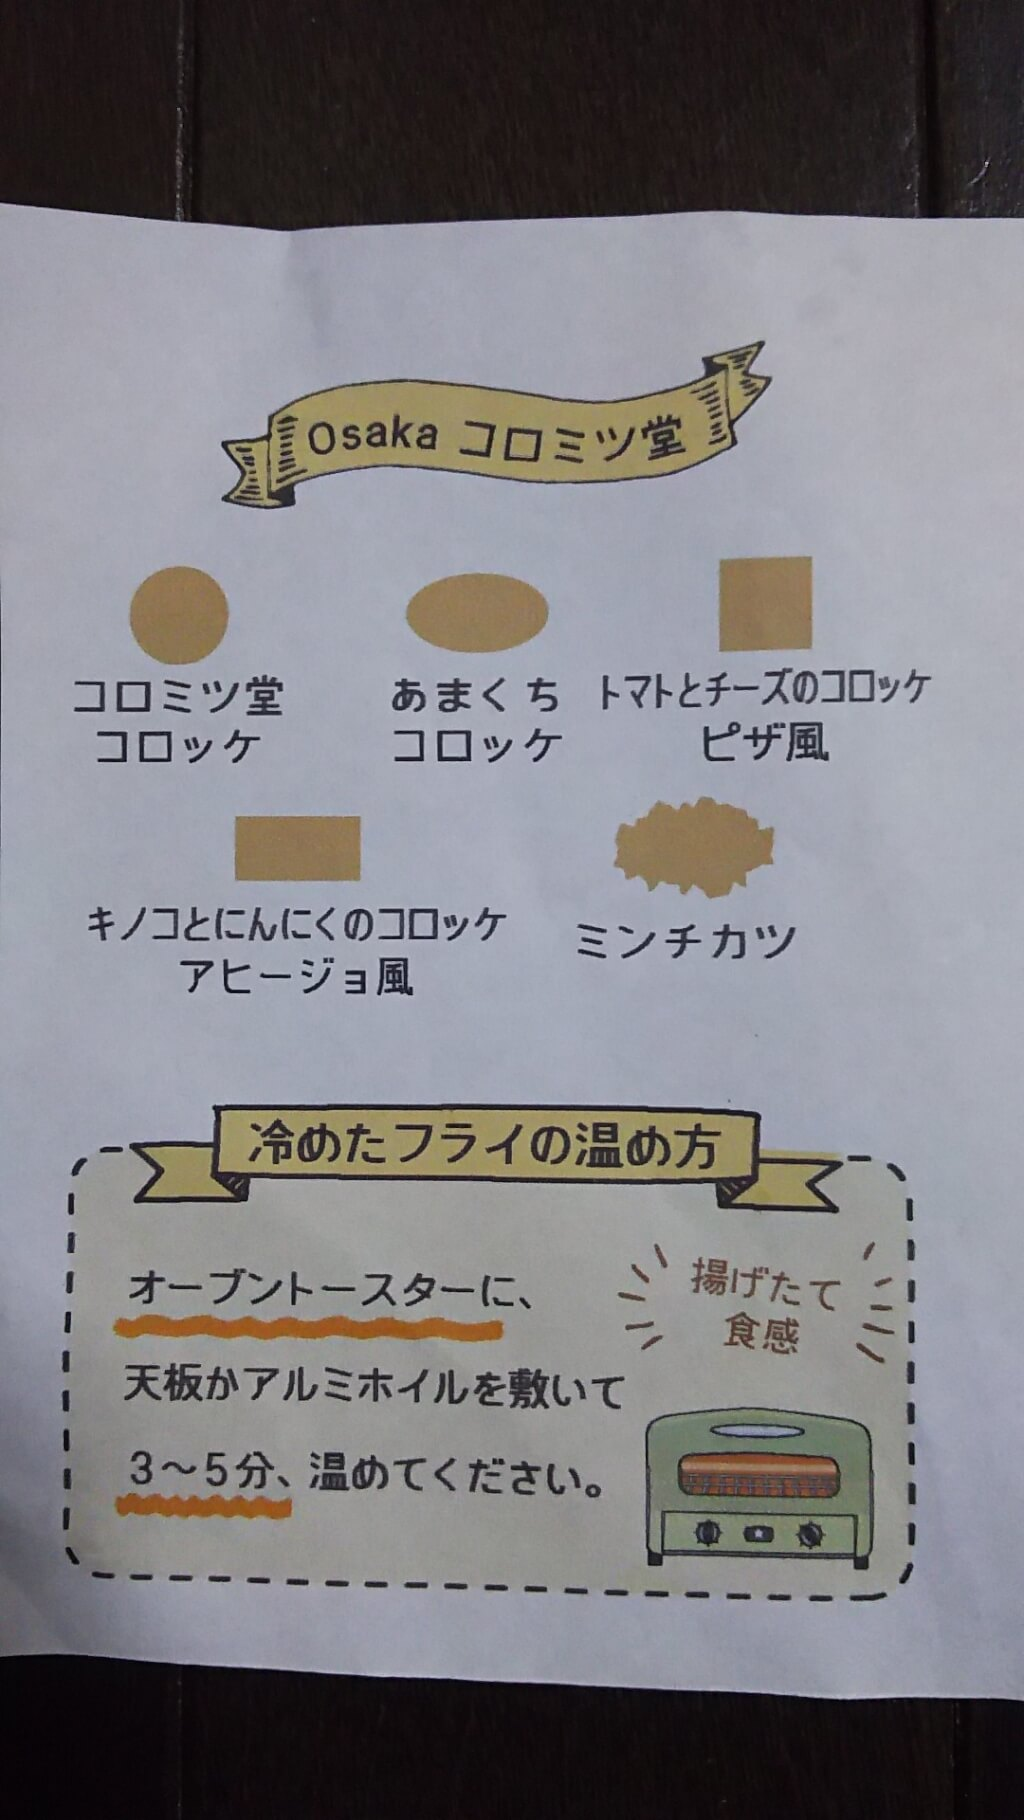 Osaka コロミツ堂 コロッケの見分け方